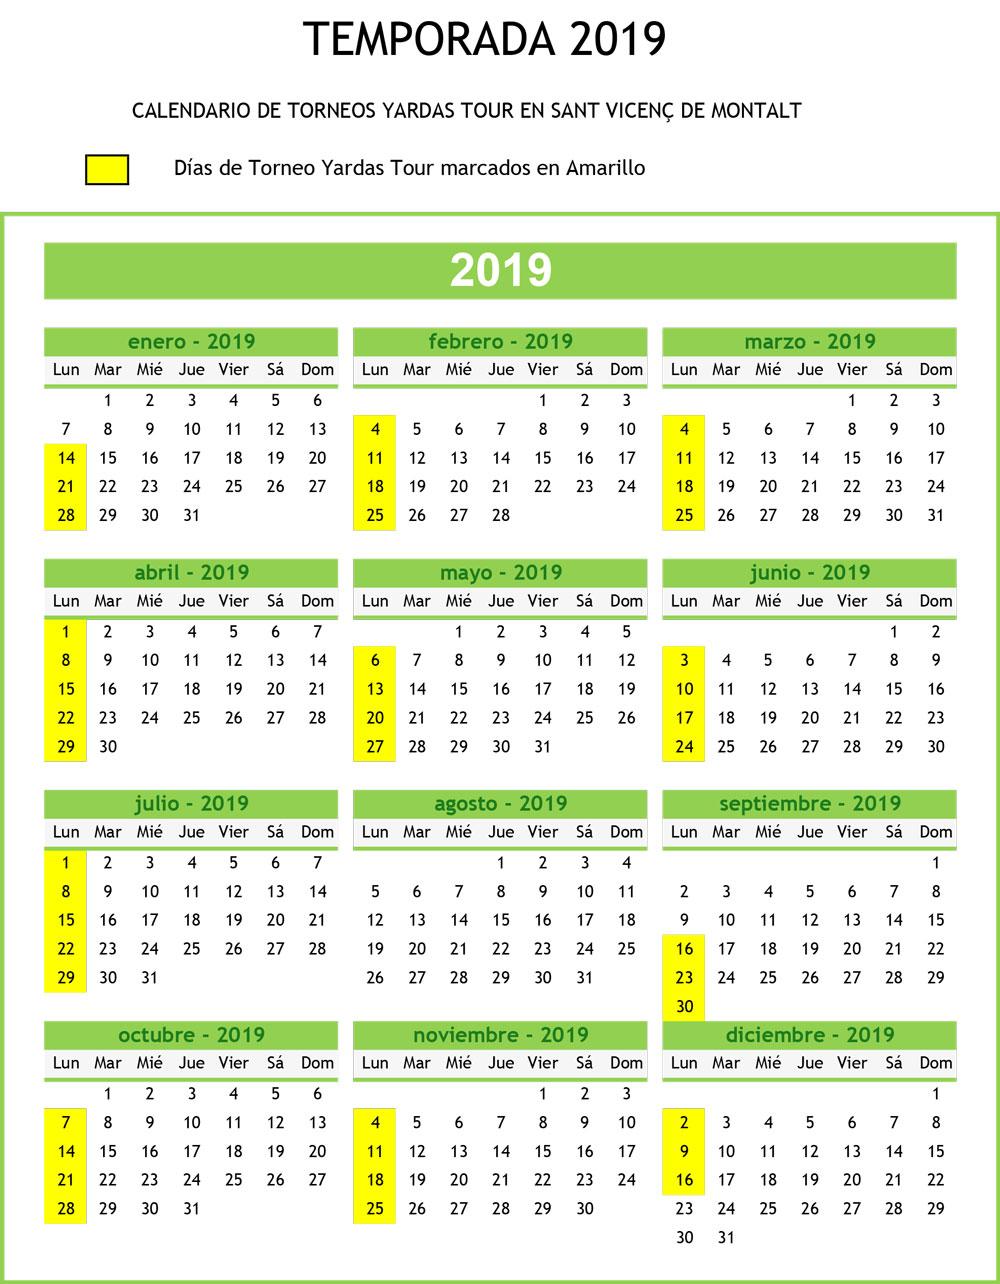 Calendario-YardasTour-Sant-Vicenc-Montalt